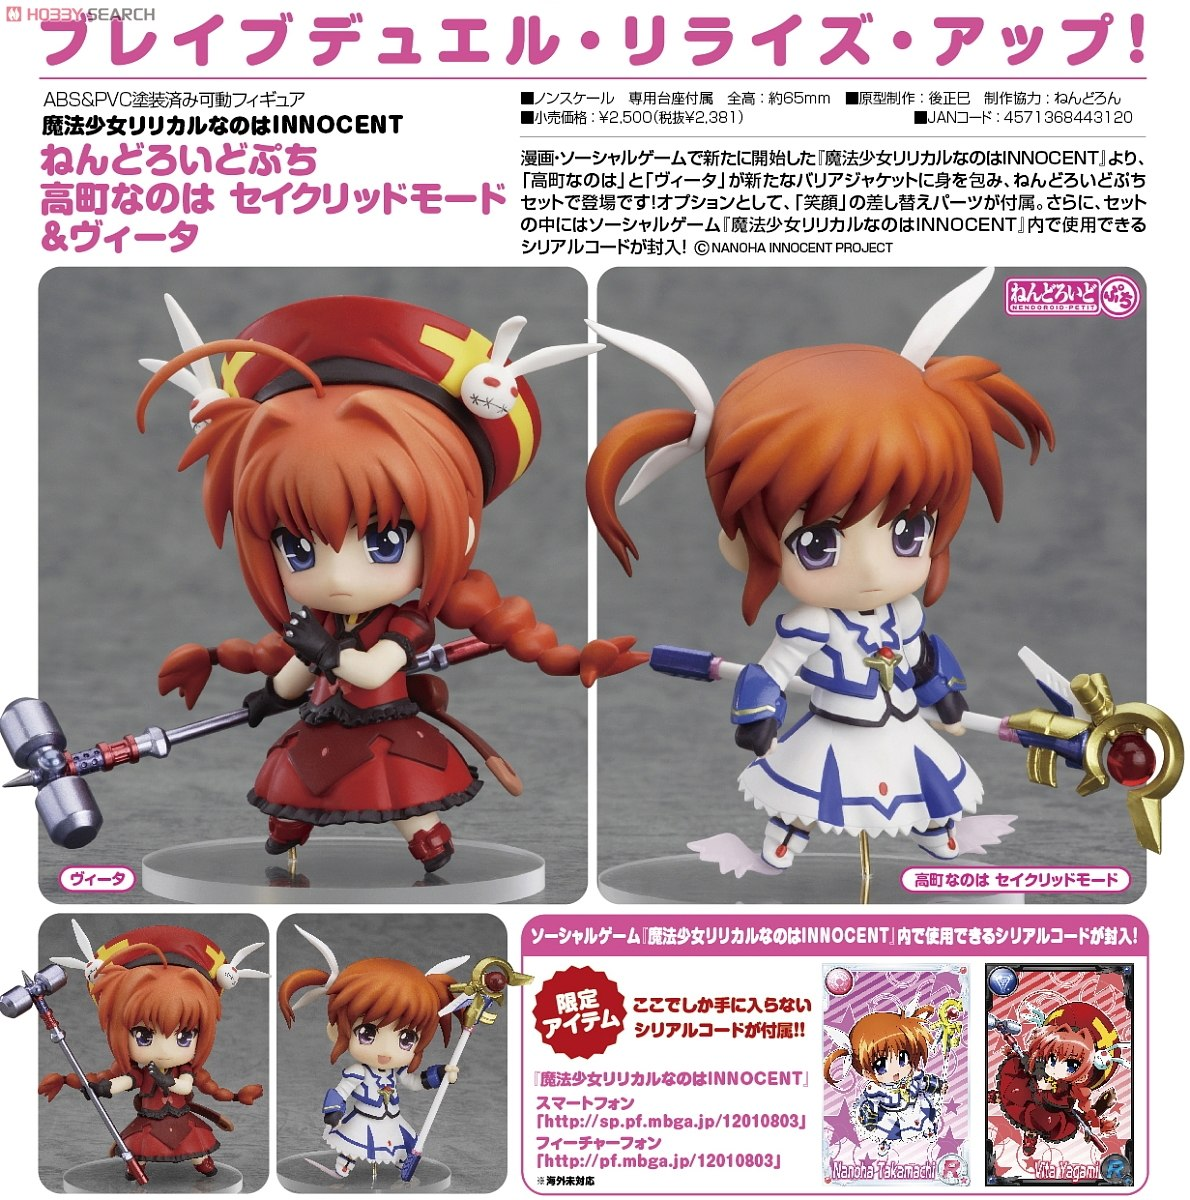 Nendoroid Puchi Takamachi Nanoha Sacred Mode & Vita [Magical Girl Lyrical Nanoha INNOCENT]